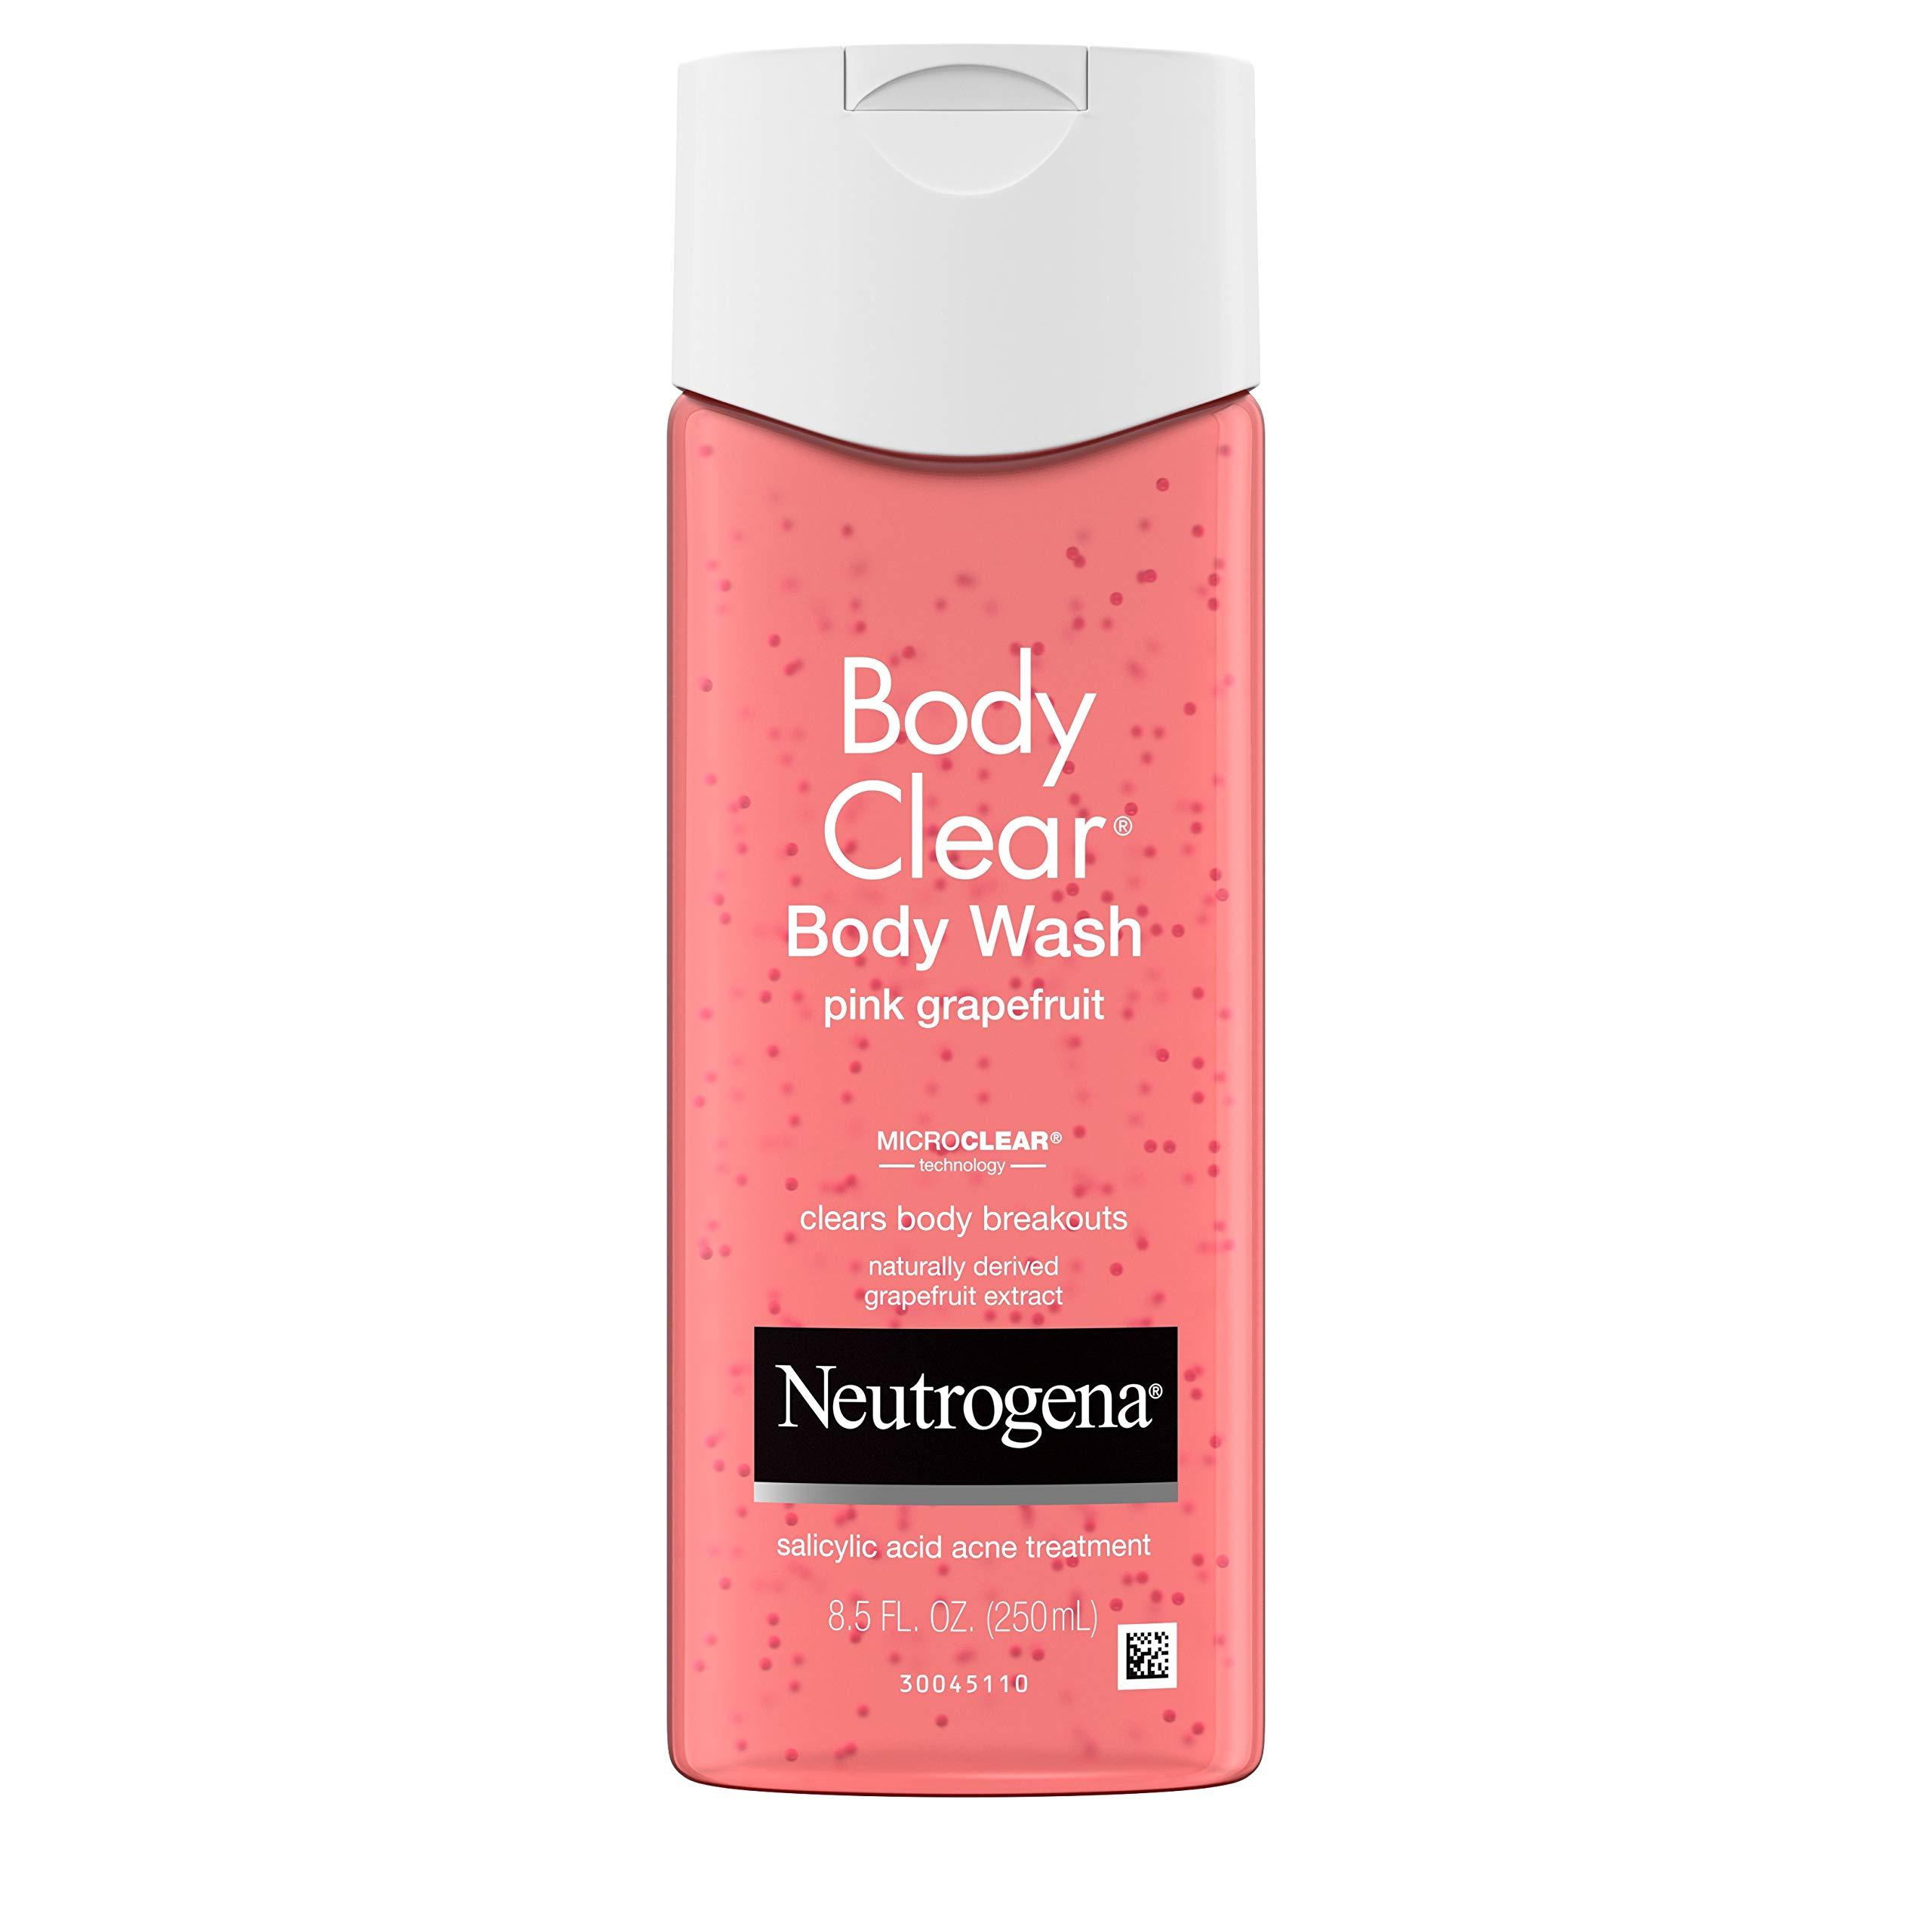 Neutrogena Body Clear Acne Treatment Body Wash with 2% Salicylic Acid Acne Medicine to Prevent Body Breakouts, Pink Grapefruit Shower Gel for Back, Chest & Shoulders, Vitamin C, 8.5 fl. oz